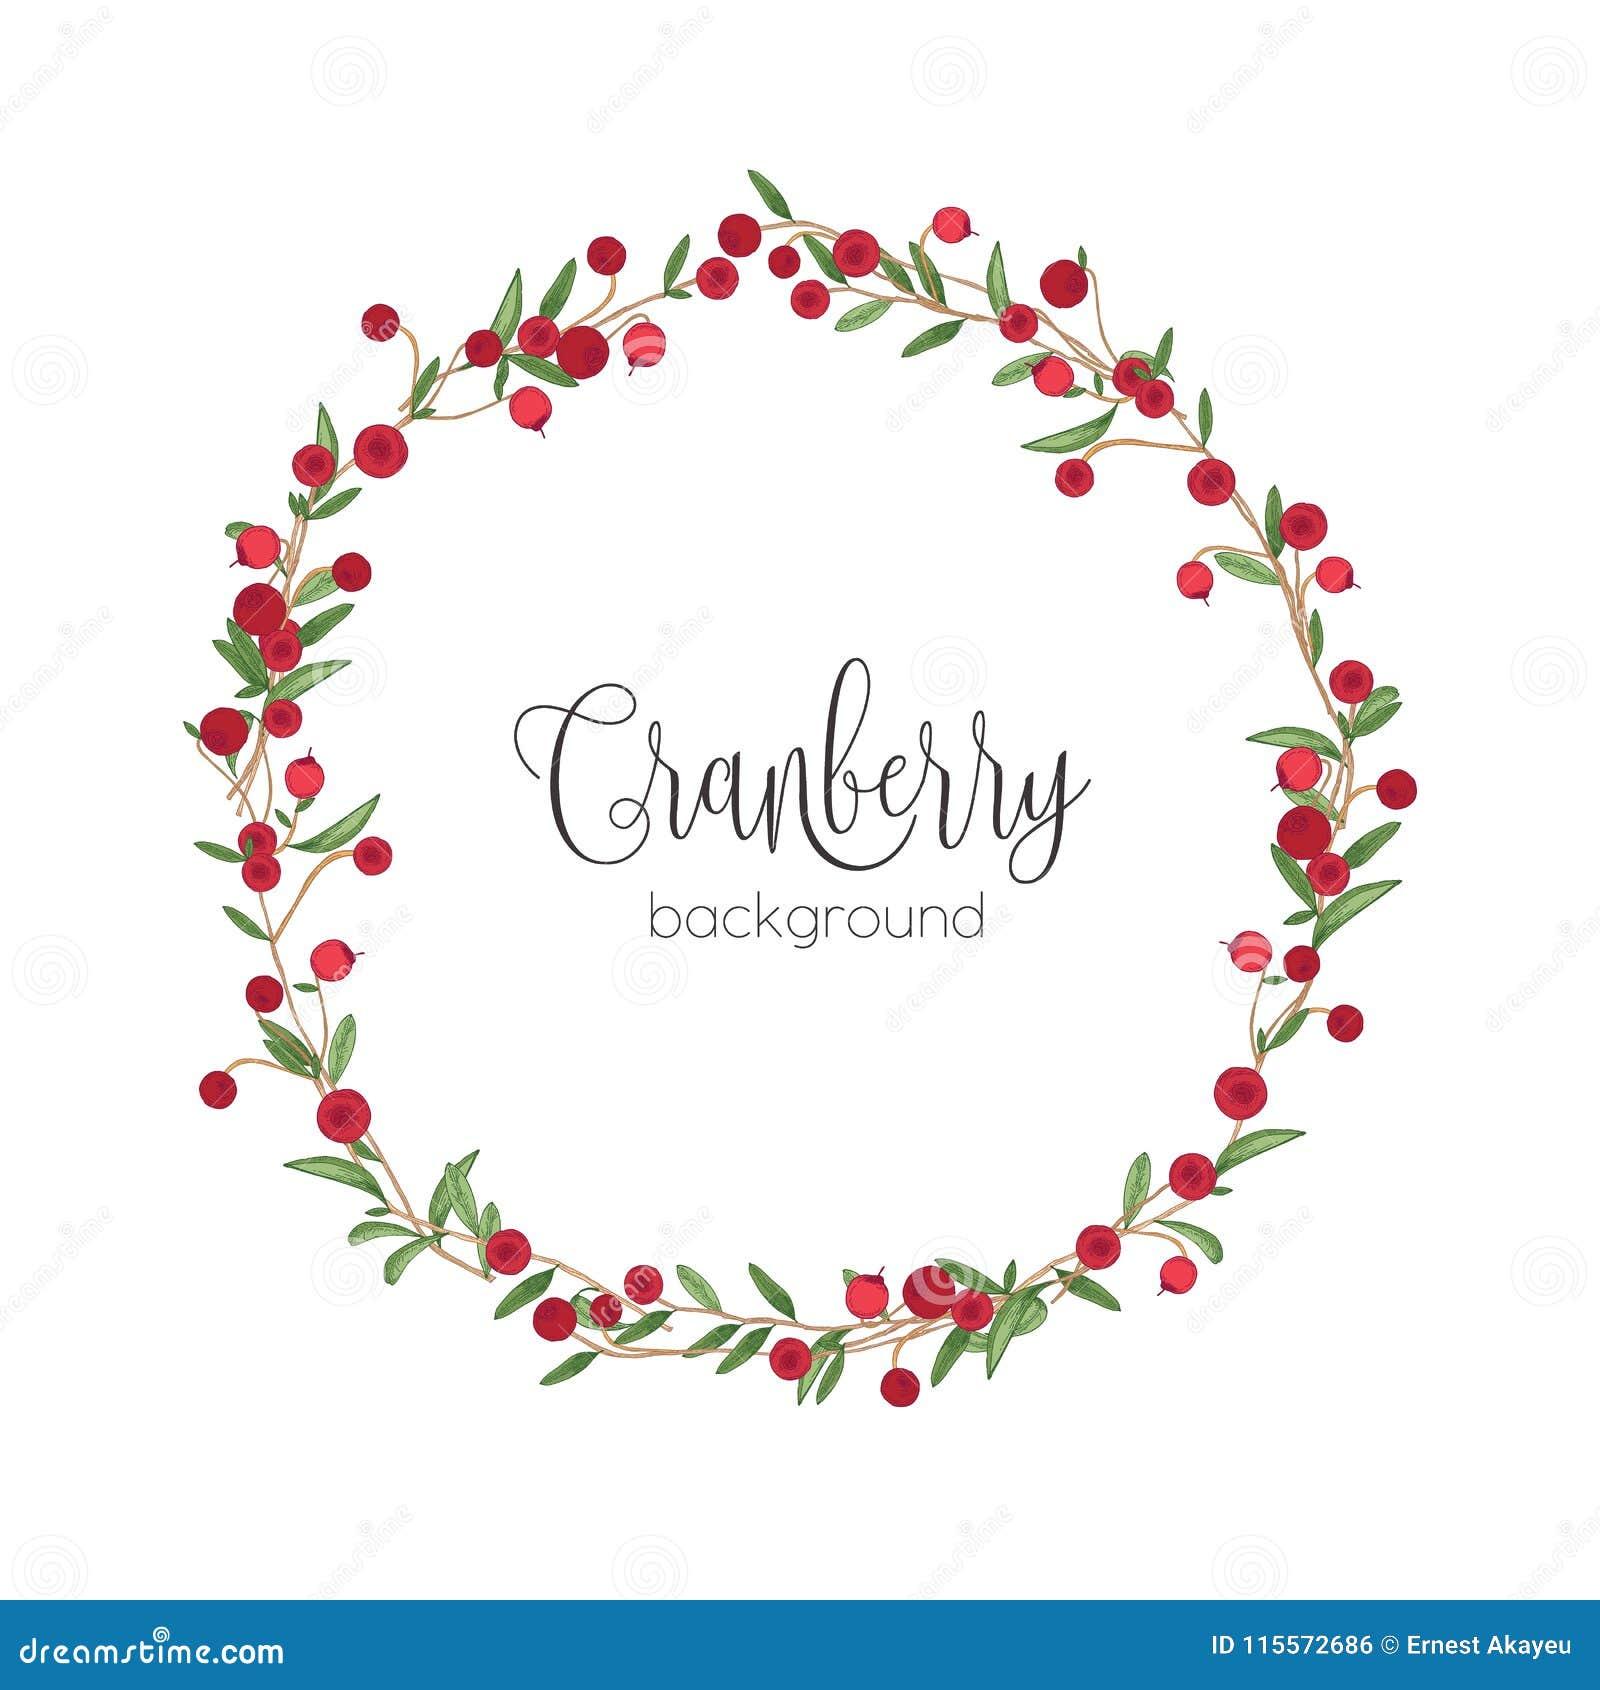 Elegant Round Wreath Or Circular Frame Made Of Cranberry